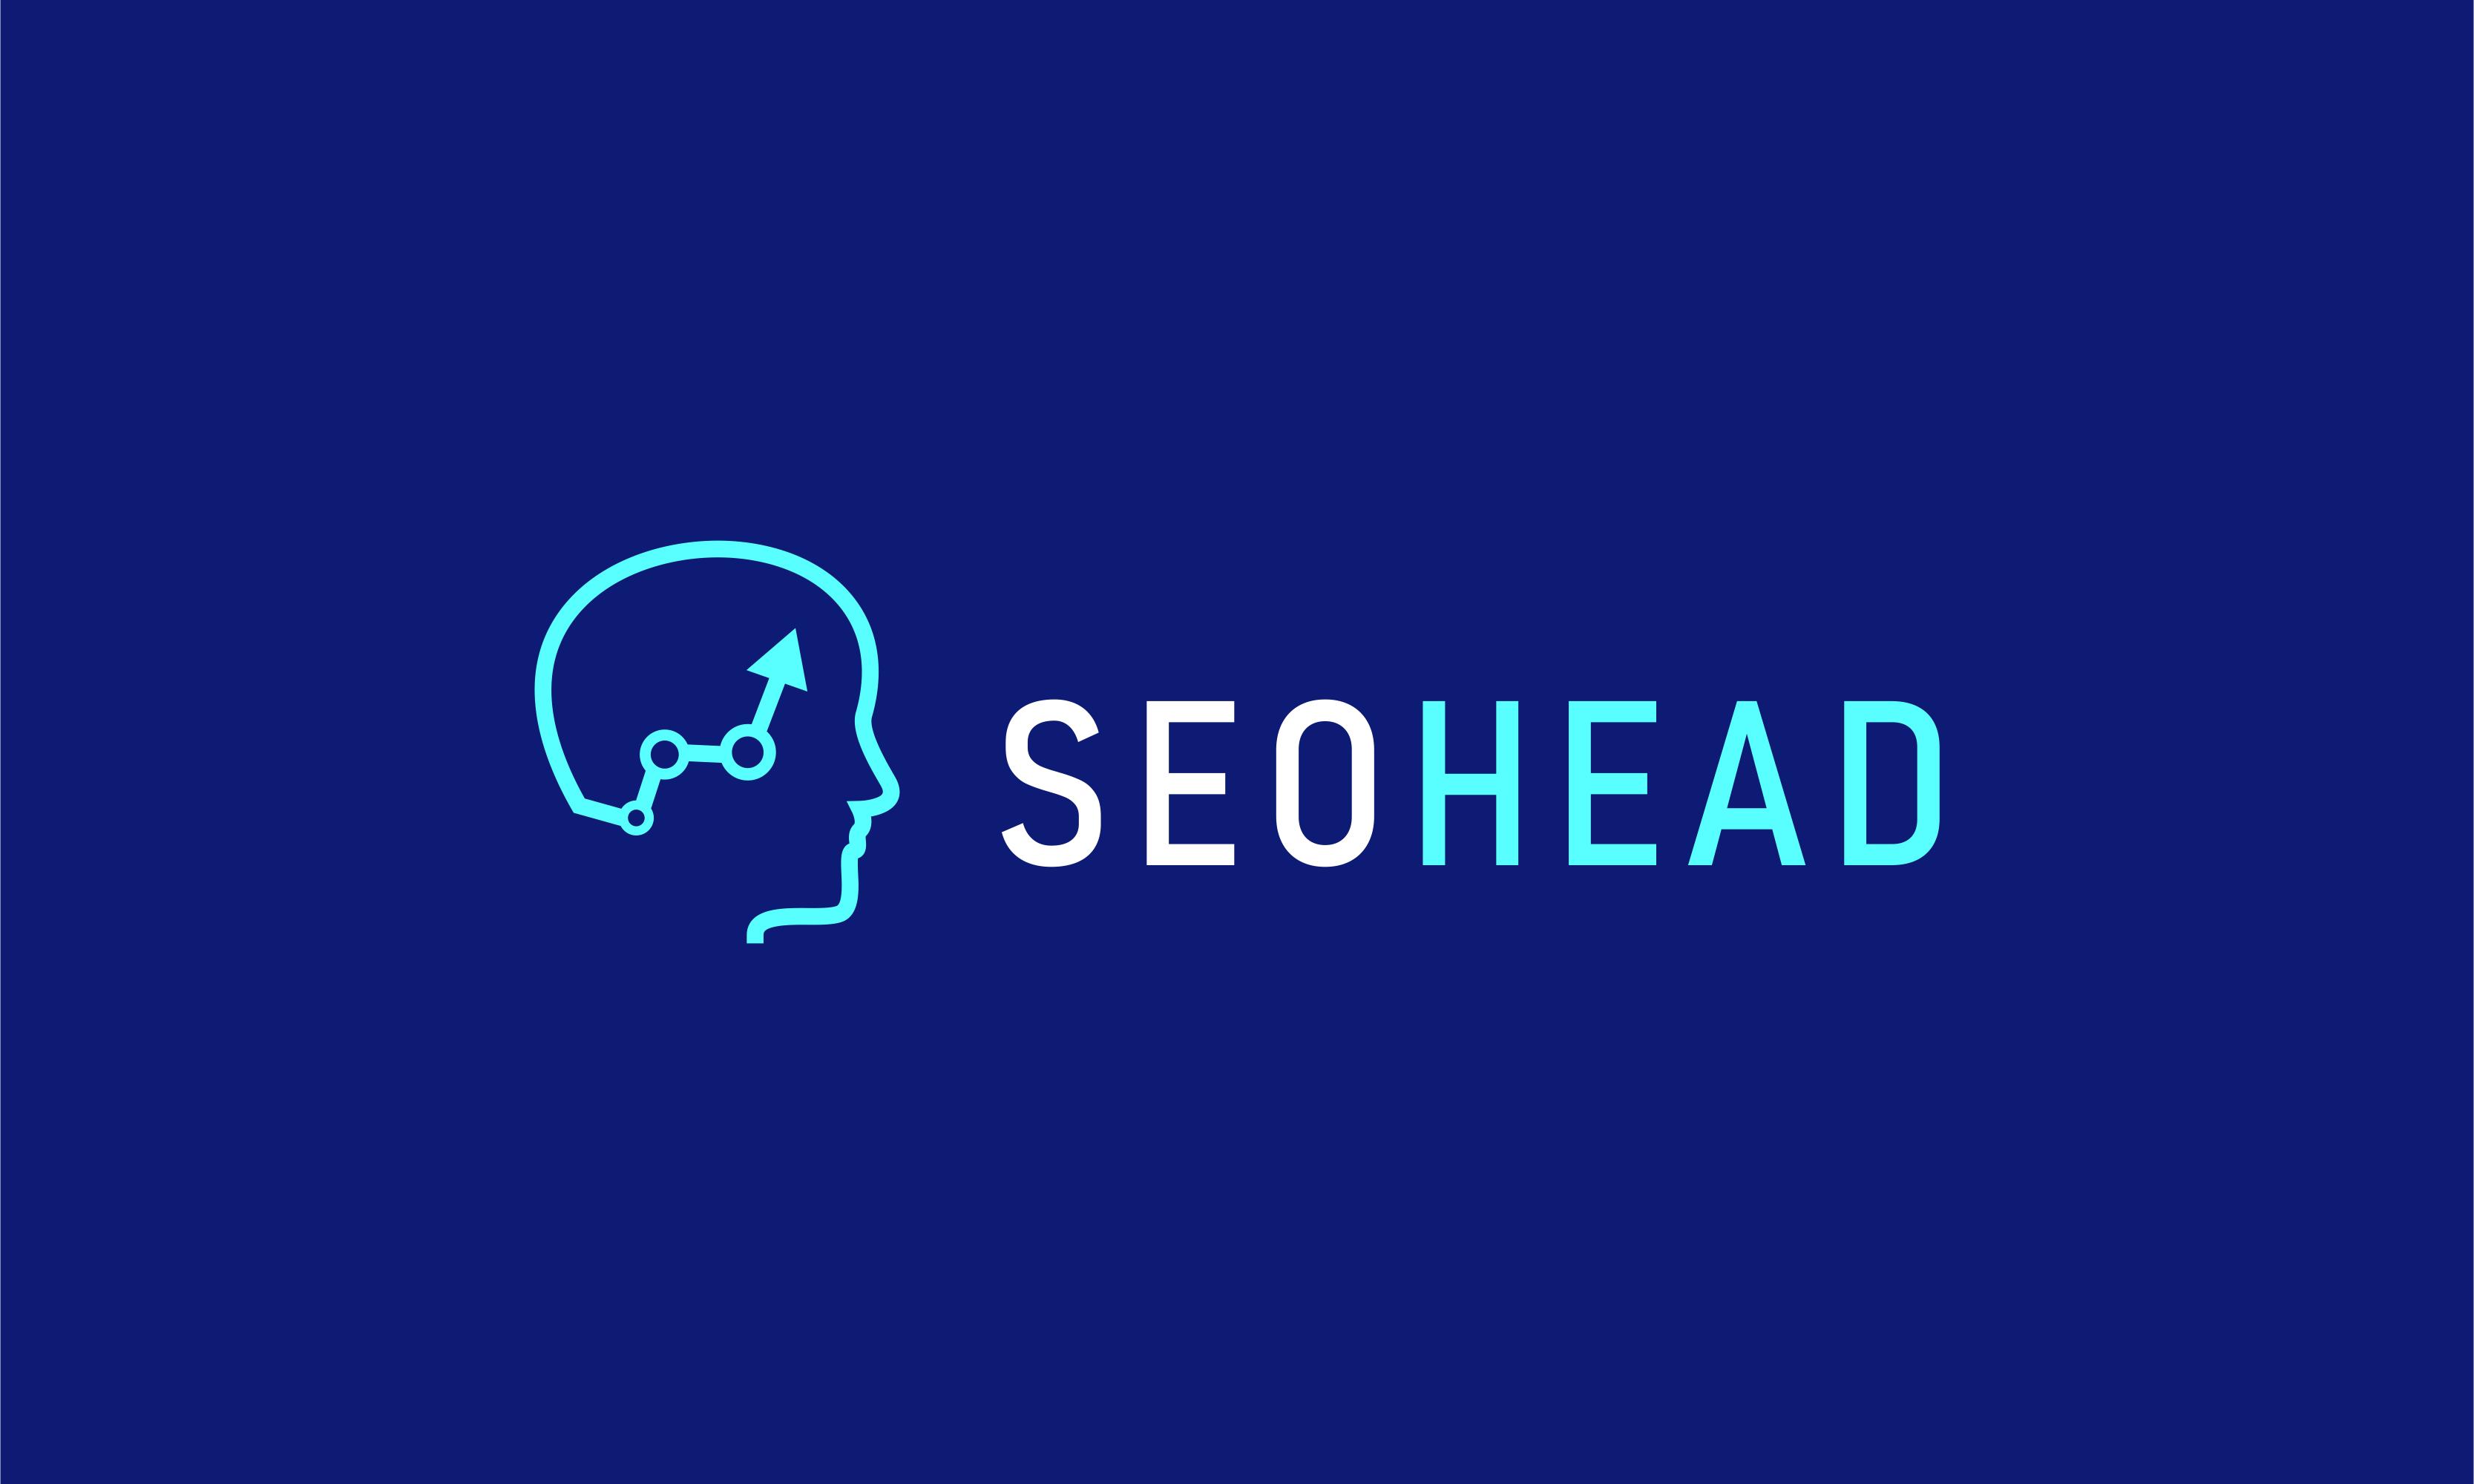 Seohead